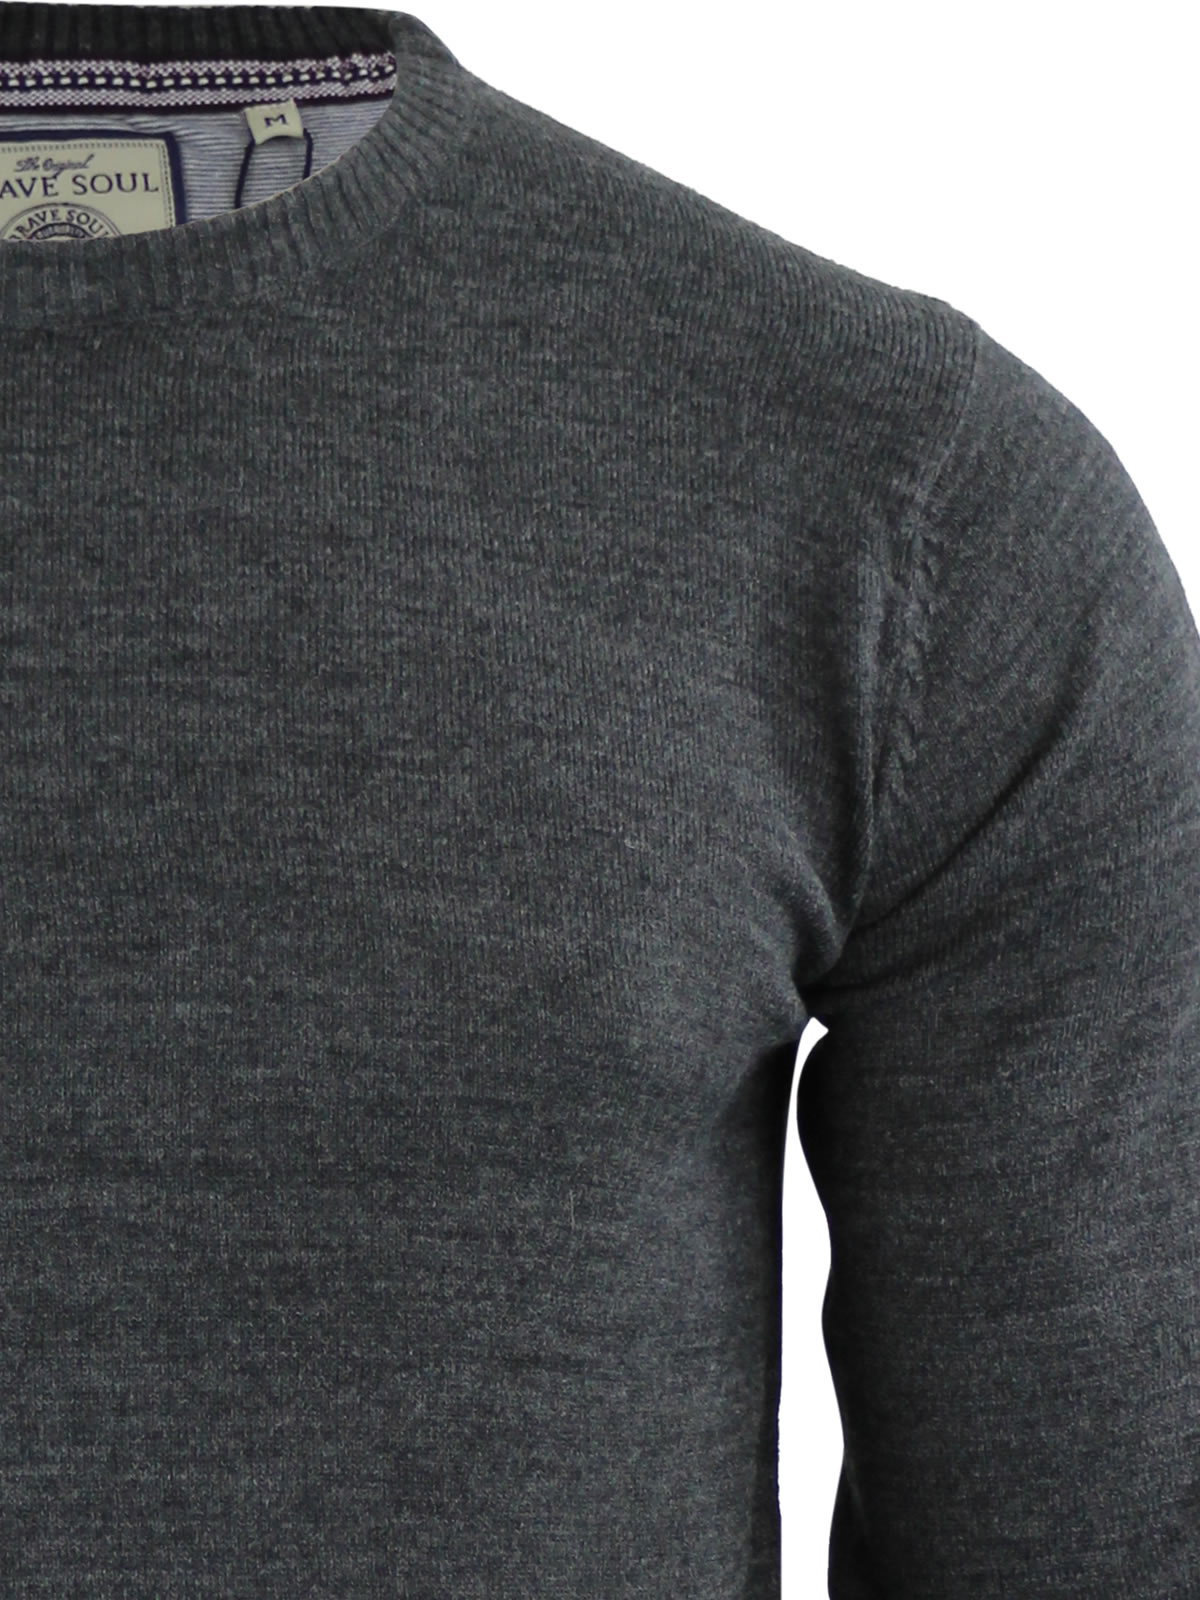 Mens-Jumper-Brave-Soul-Urbain-Knitted-Crew-Neck-Sweater thumbnail 7